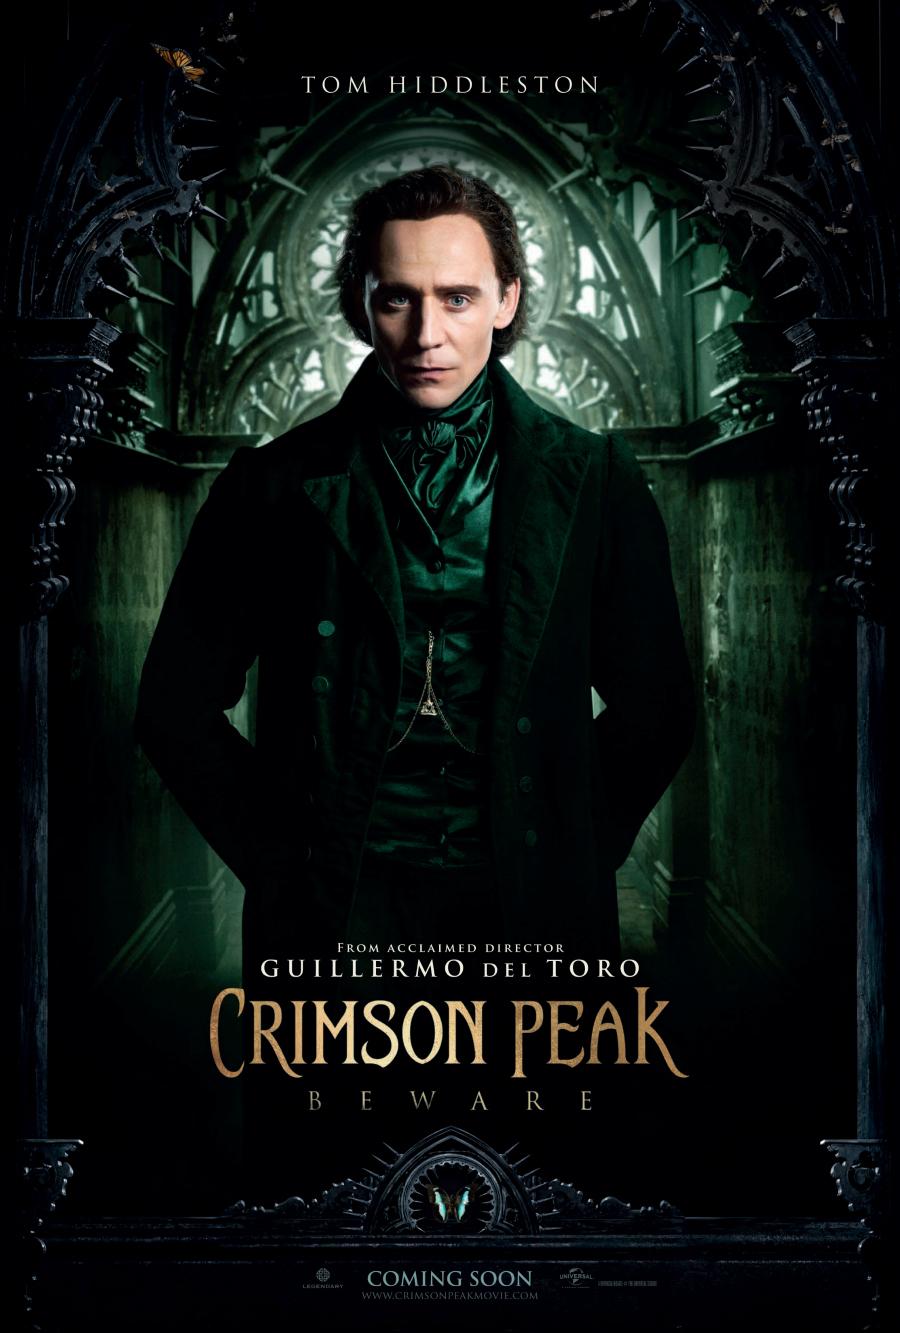 filme crimson peak poster imdb cinema review tom hiddleston